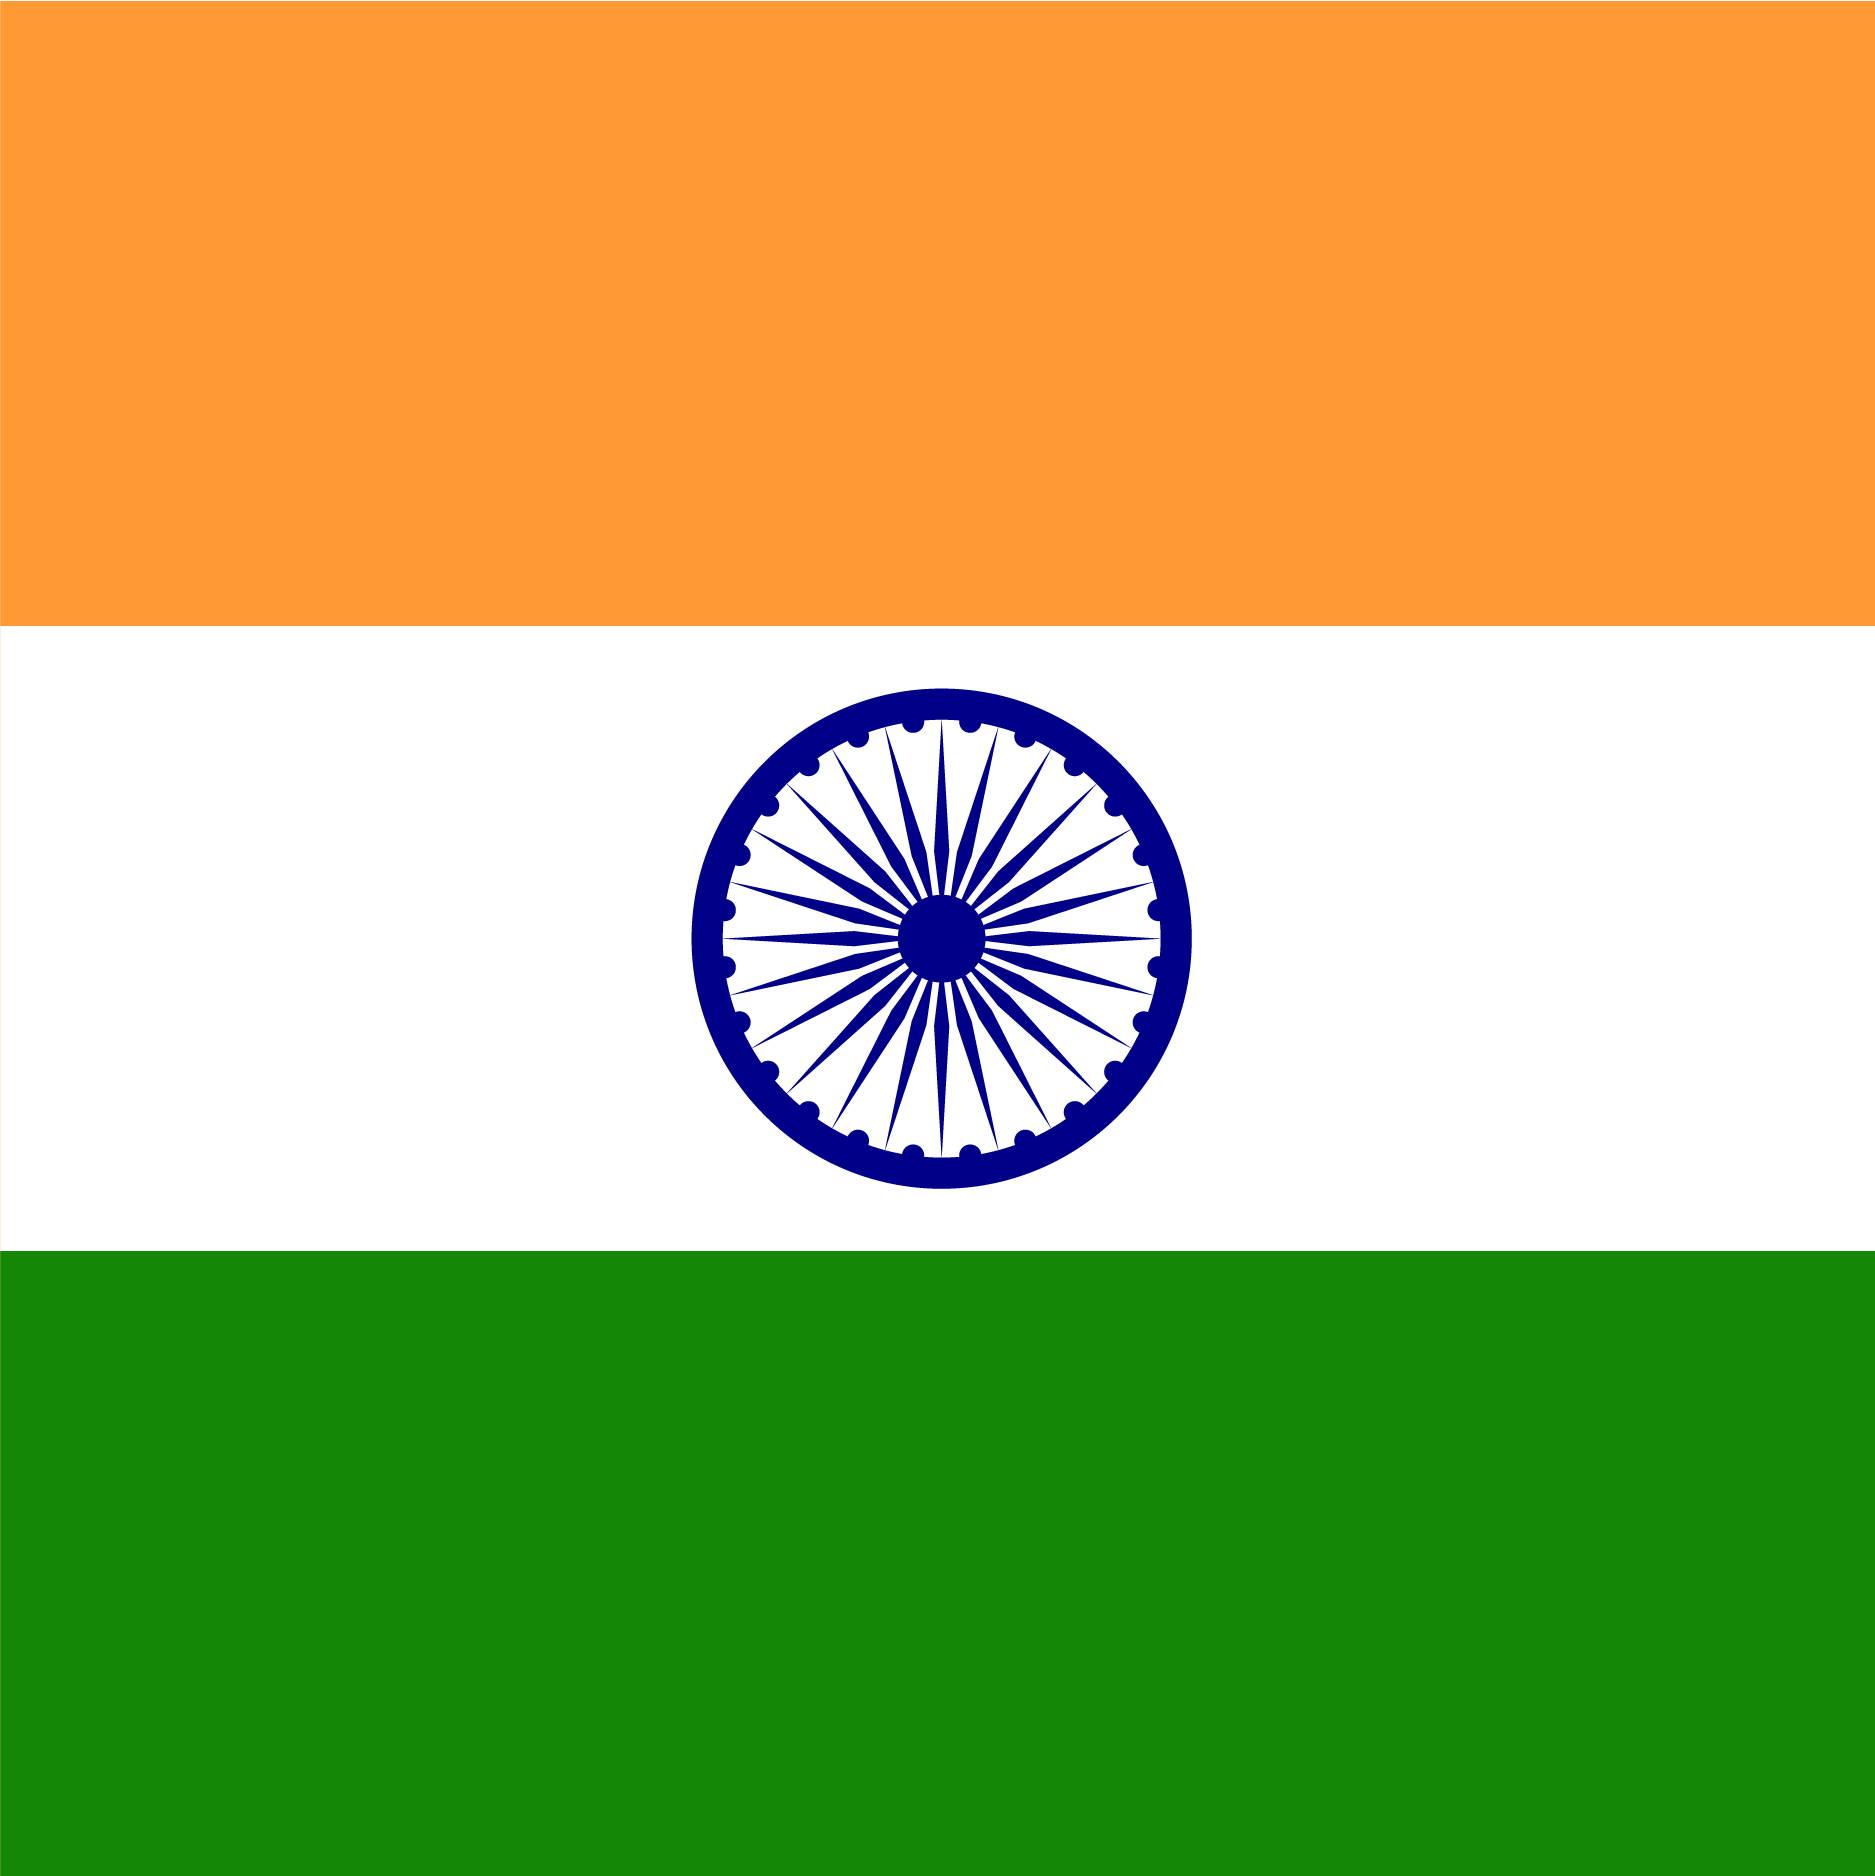 The India Flag